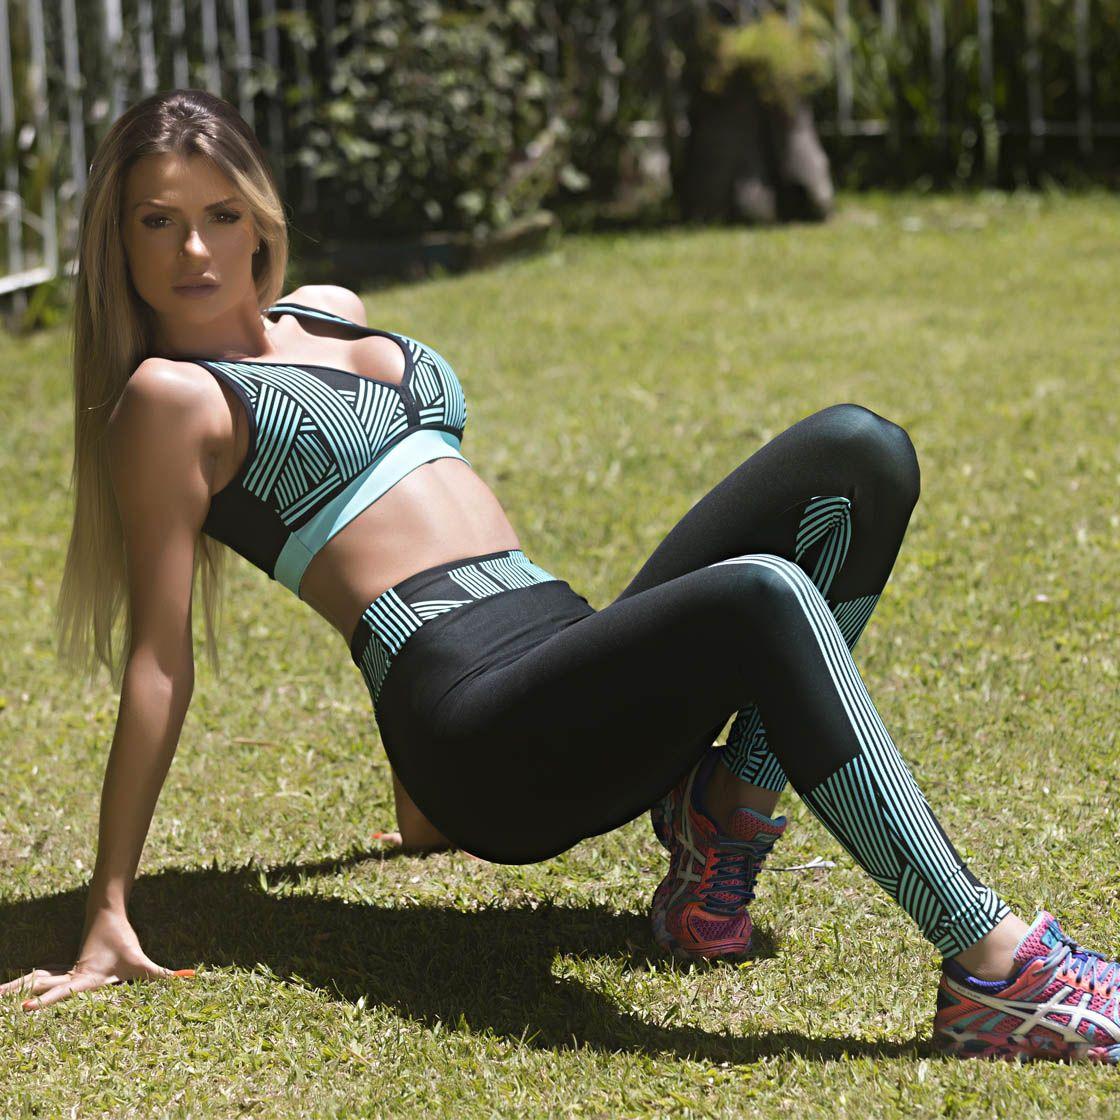 Notícias - Moda Fitness: Roupas Fitness Femininas | Santa Forma ...